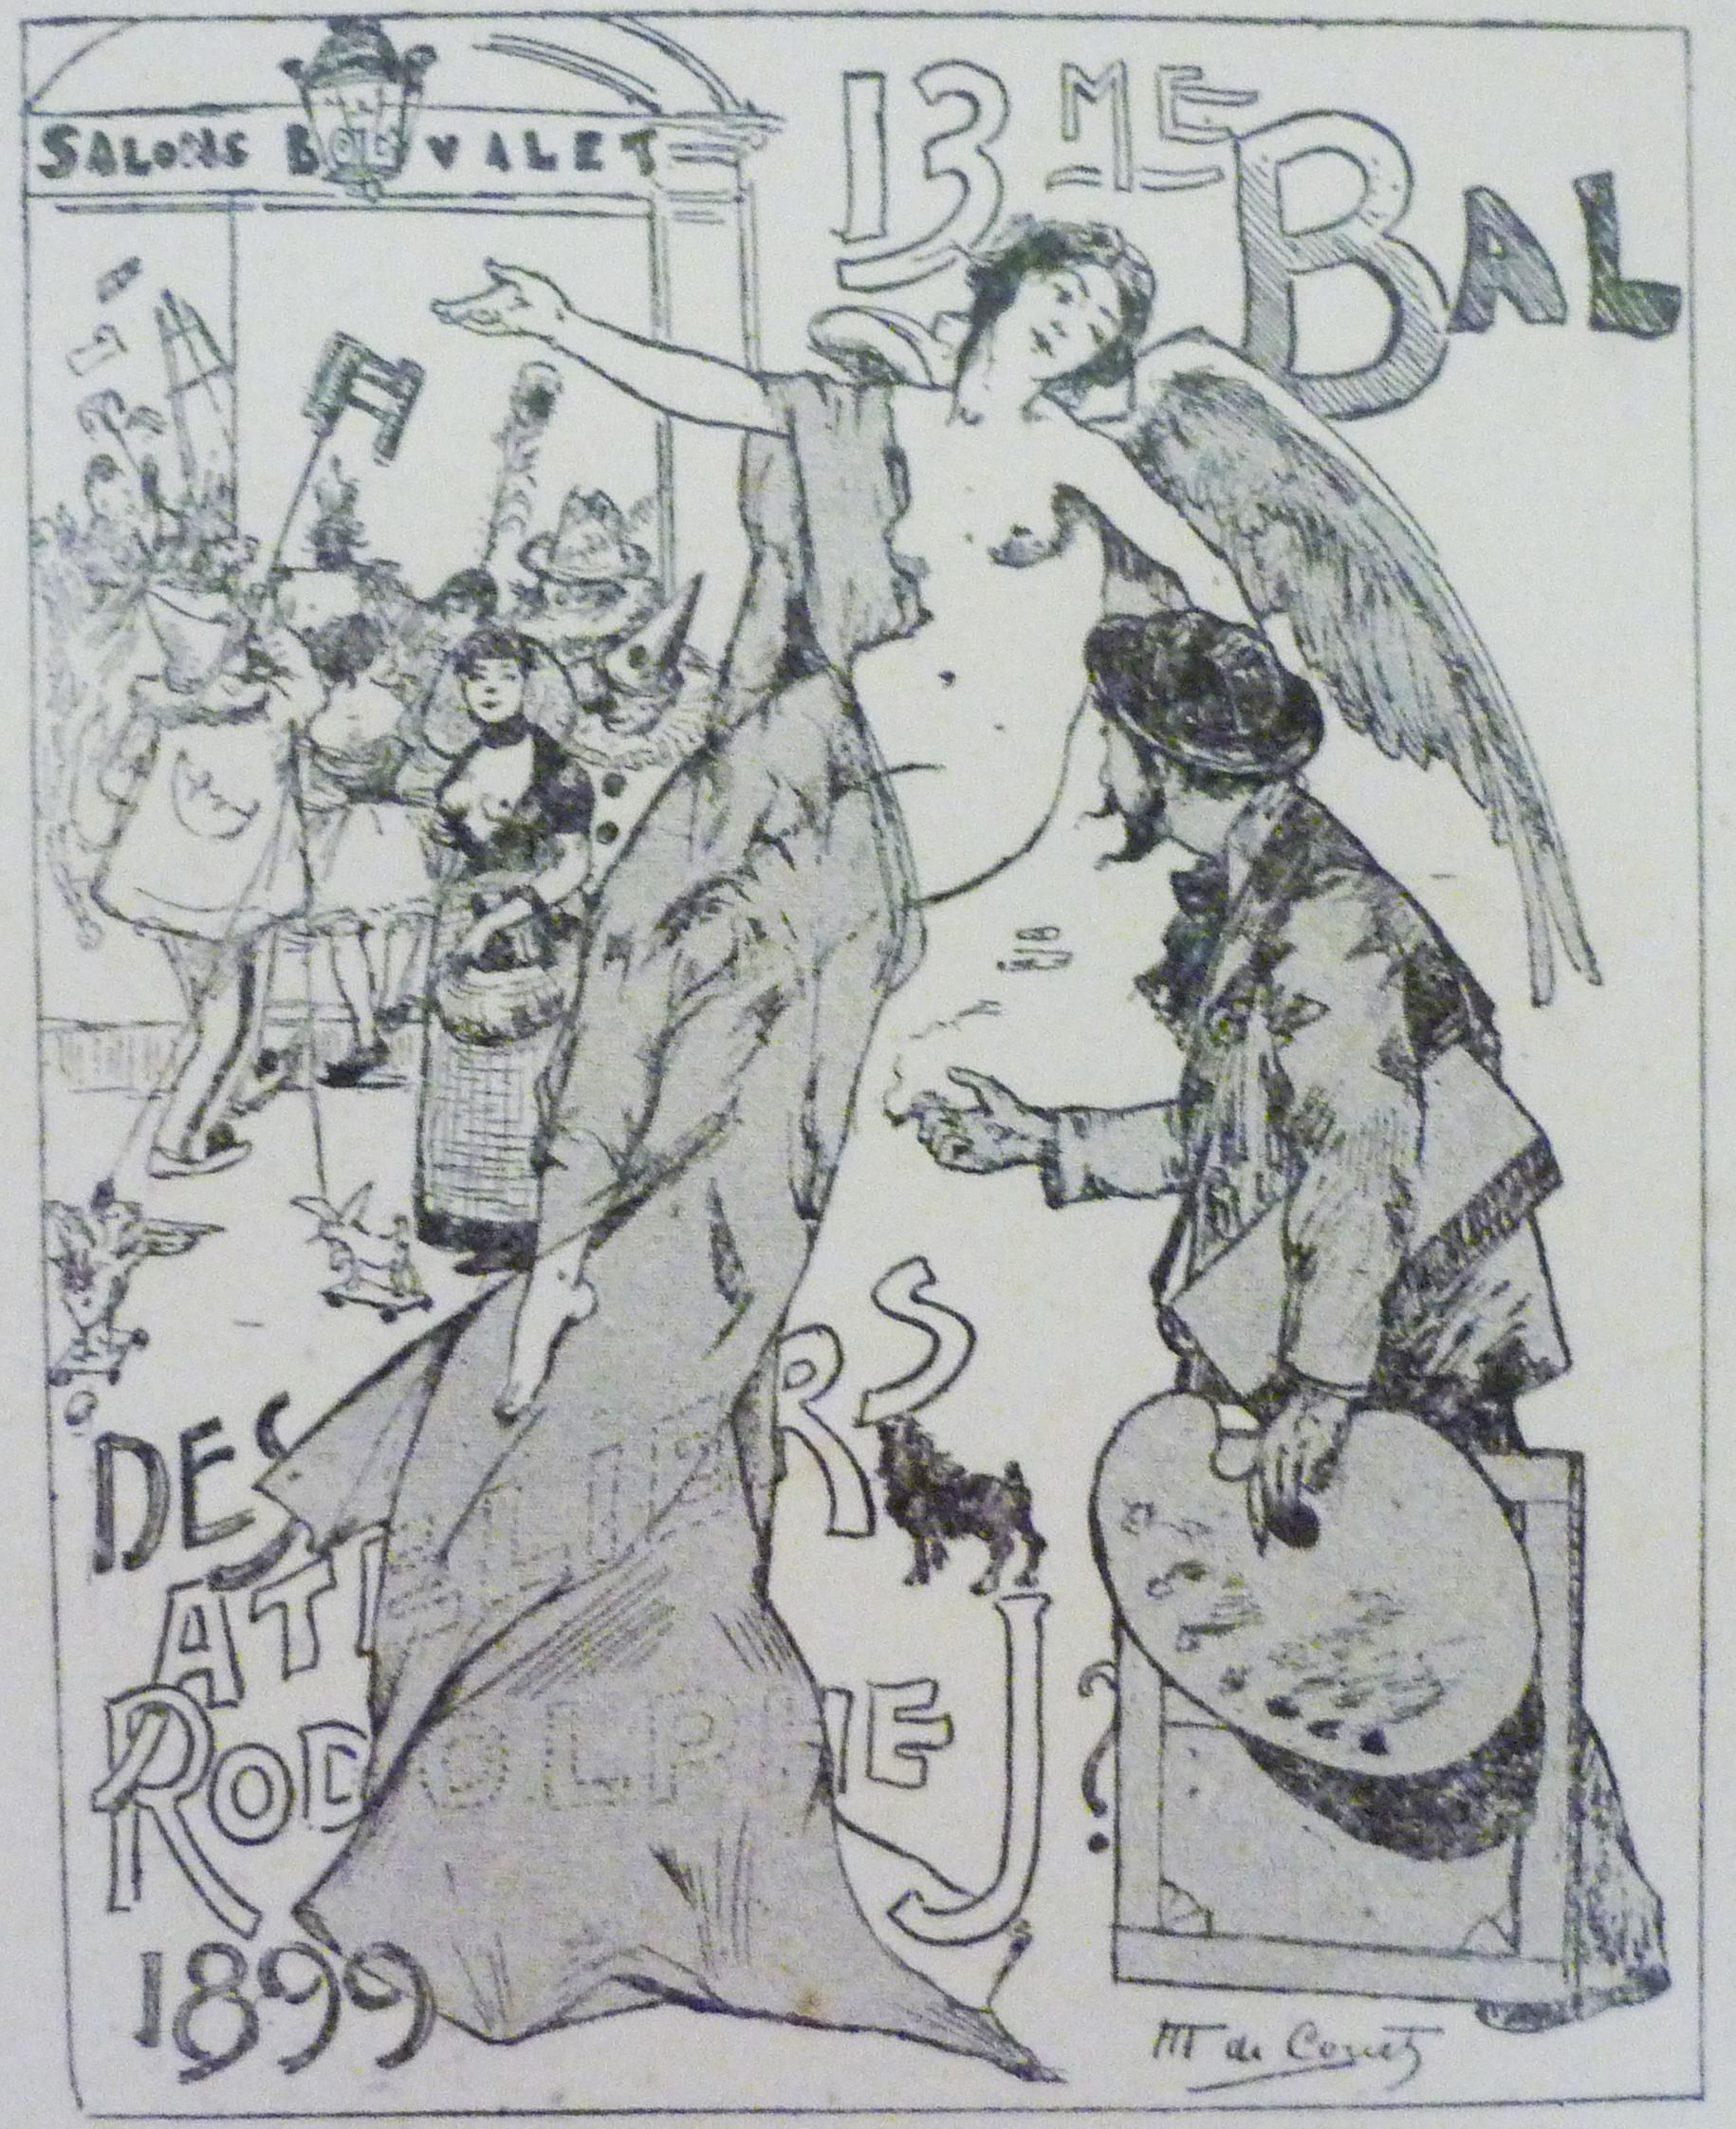 1899, 13e-bal def